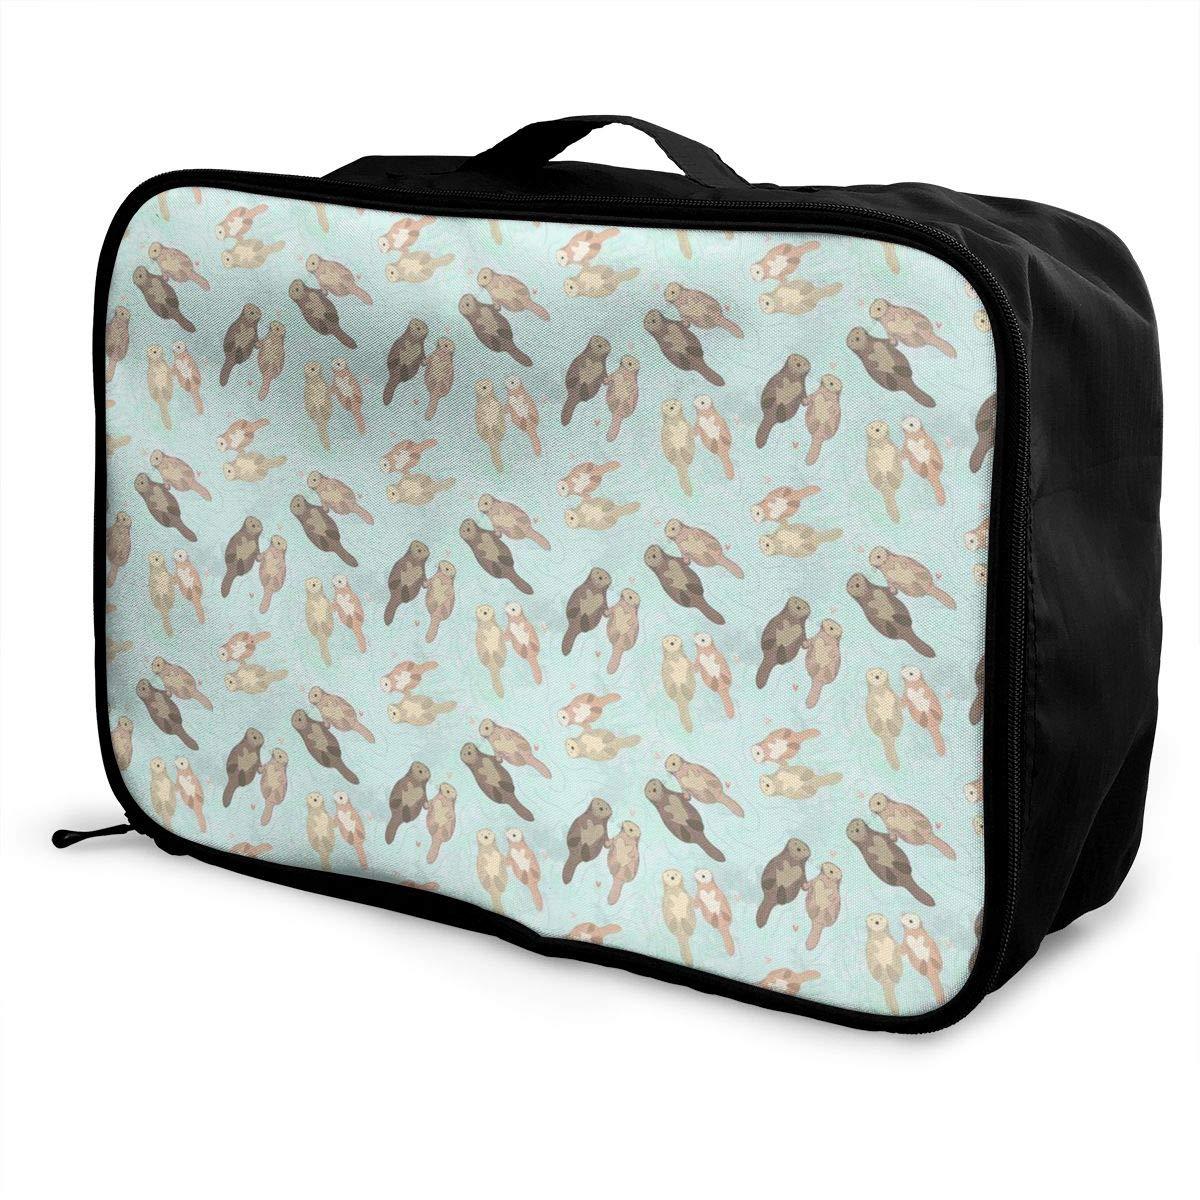 Cute Sloths Travel Duffel Bag Casual Large Capacity Portable Luggage Bag Suitcase Storage Bag Luggage Packing Tote Bag Weekend Trip